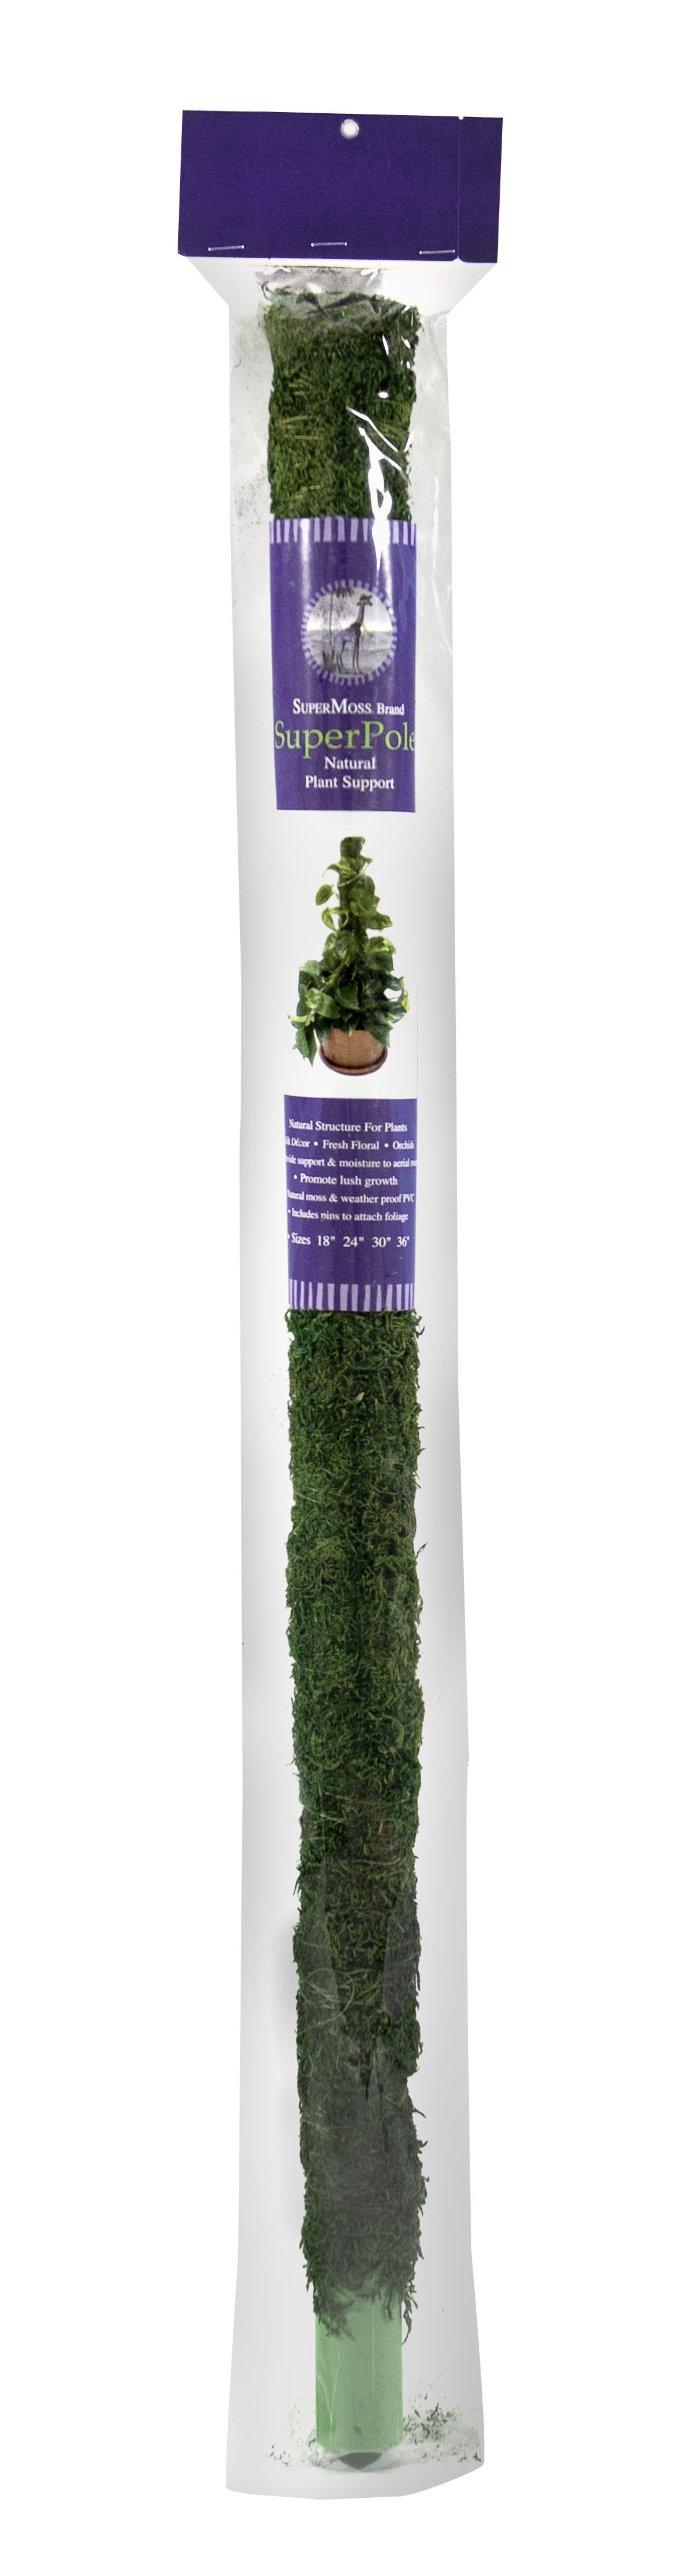 Supermoss Moss Poles Preserved 23ft